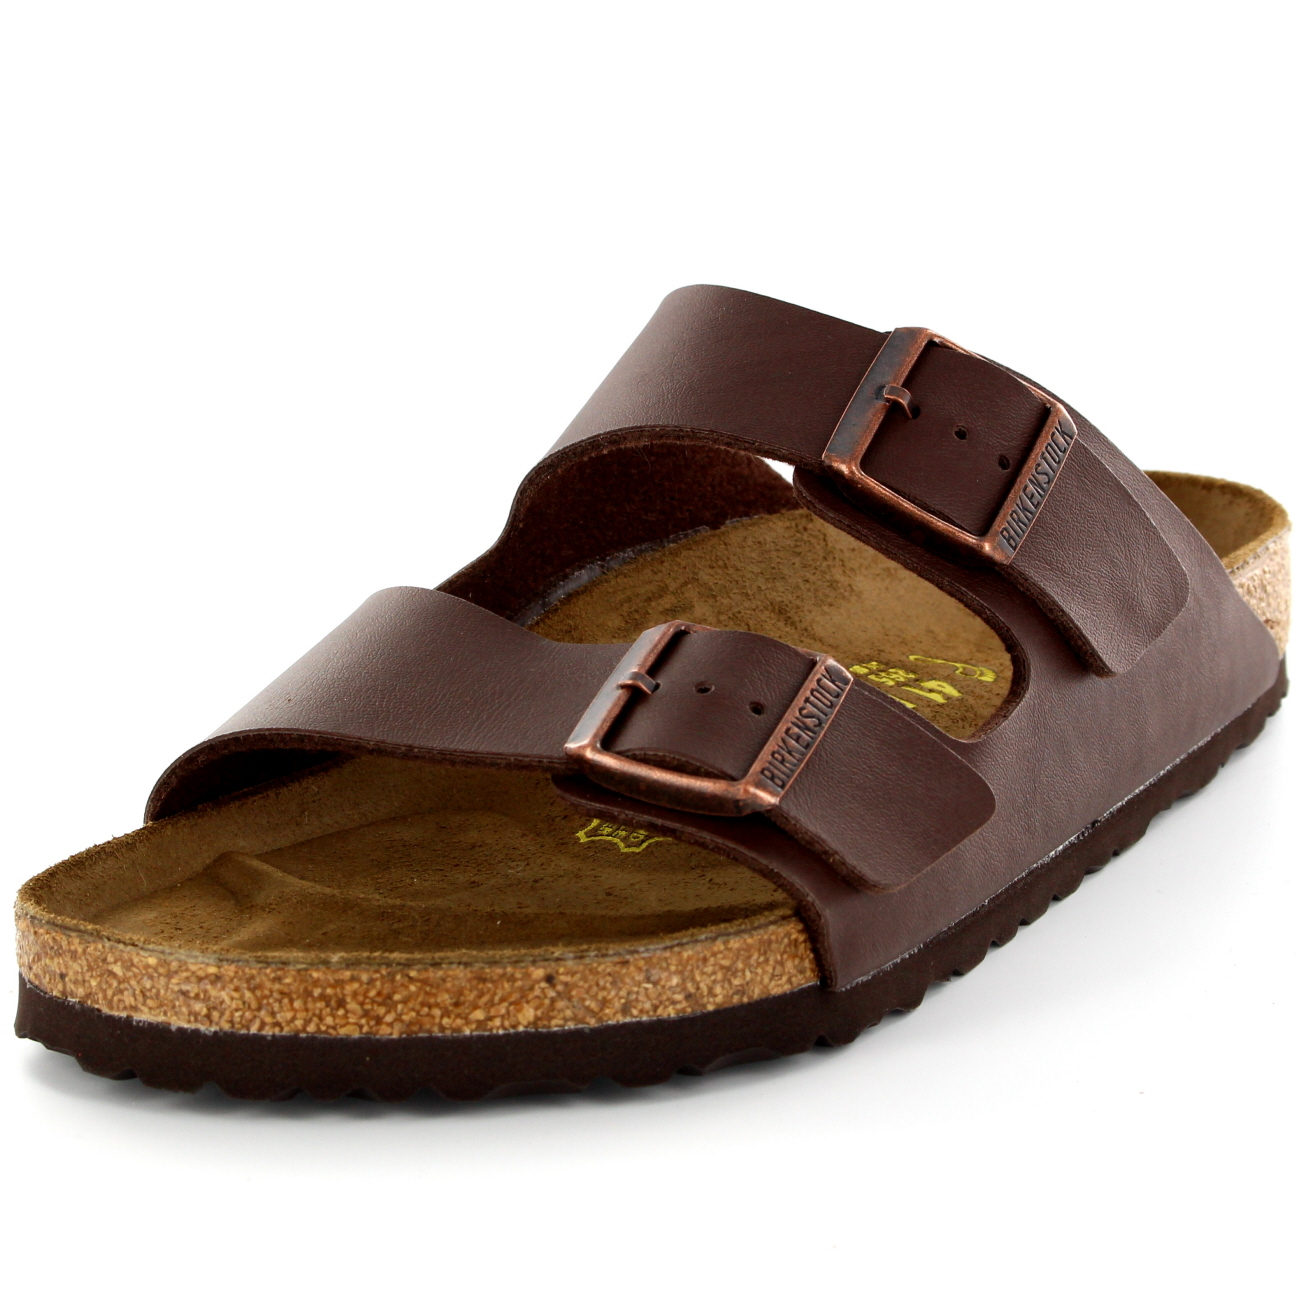 57dee63563bf Mens Birkenstock Arizona Leather Buckle Summer Holiday Beach Sandals ...